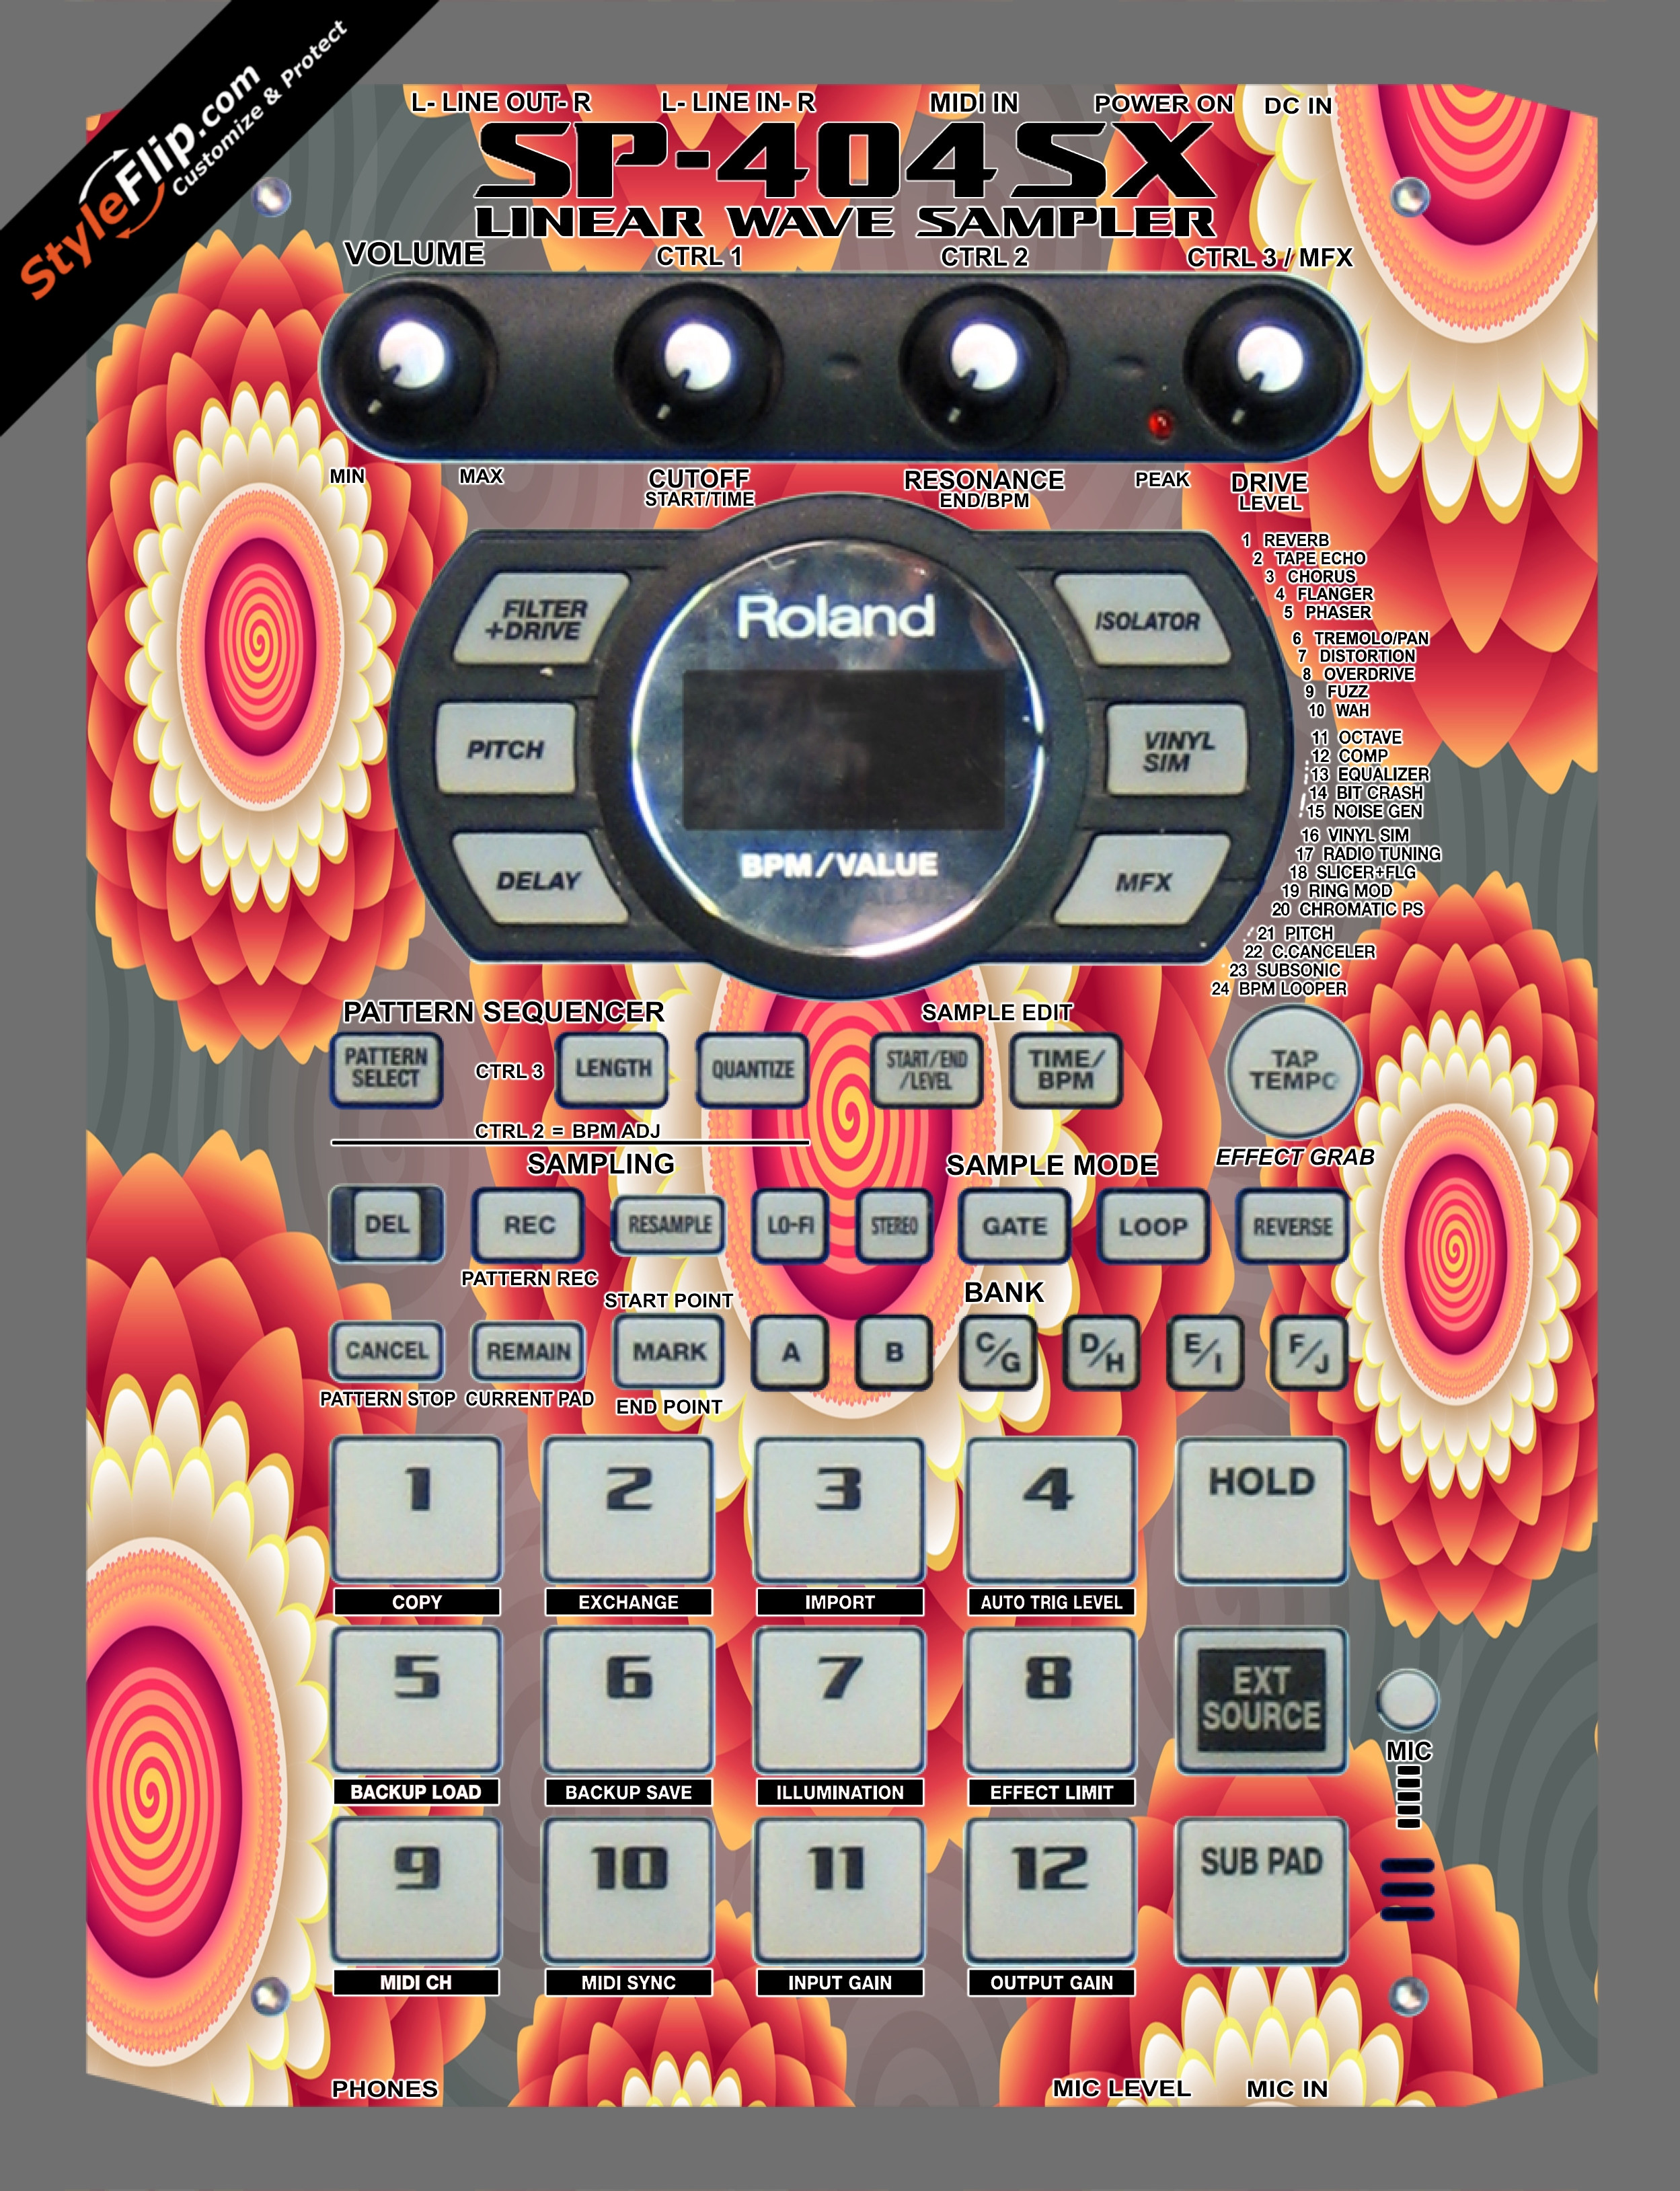 Hypnotic Roland SP-404 SX